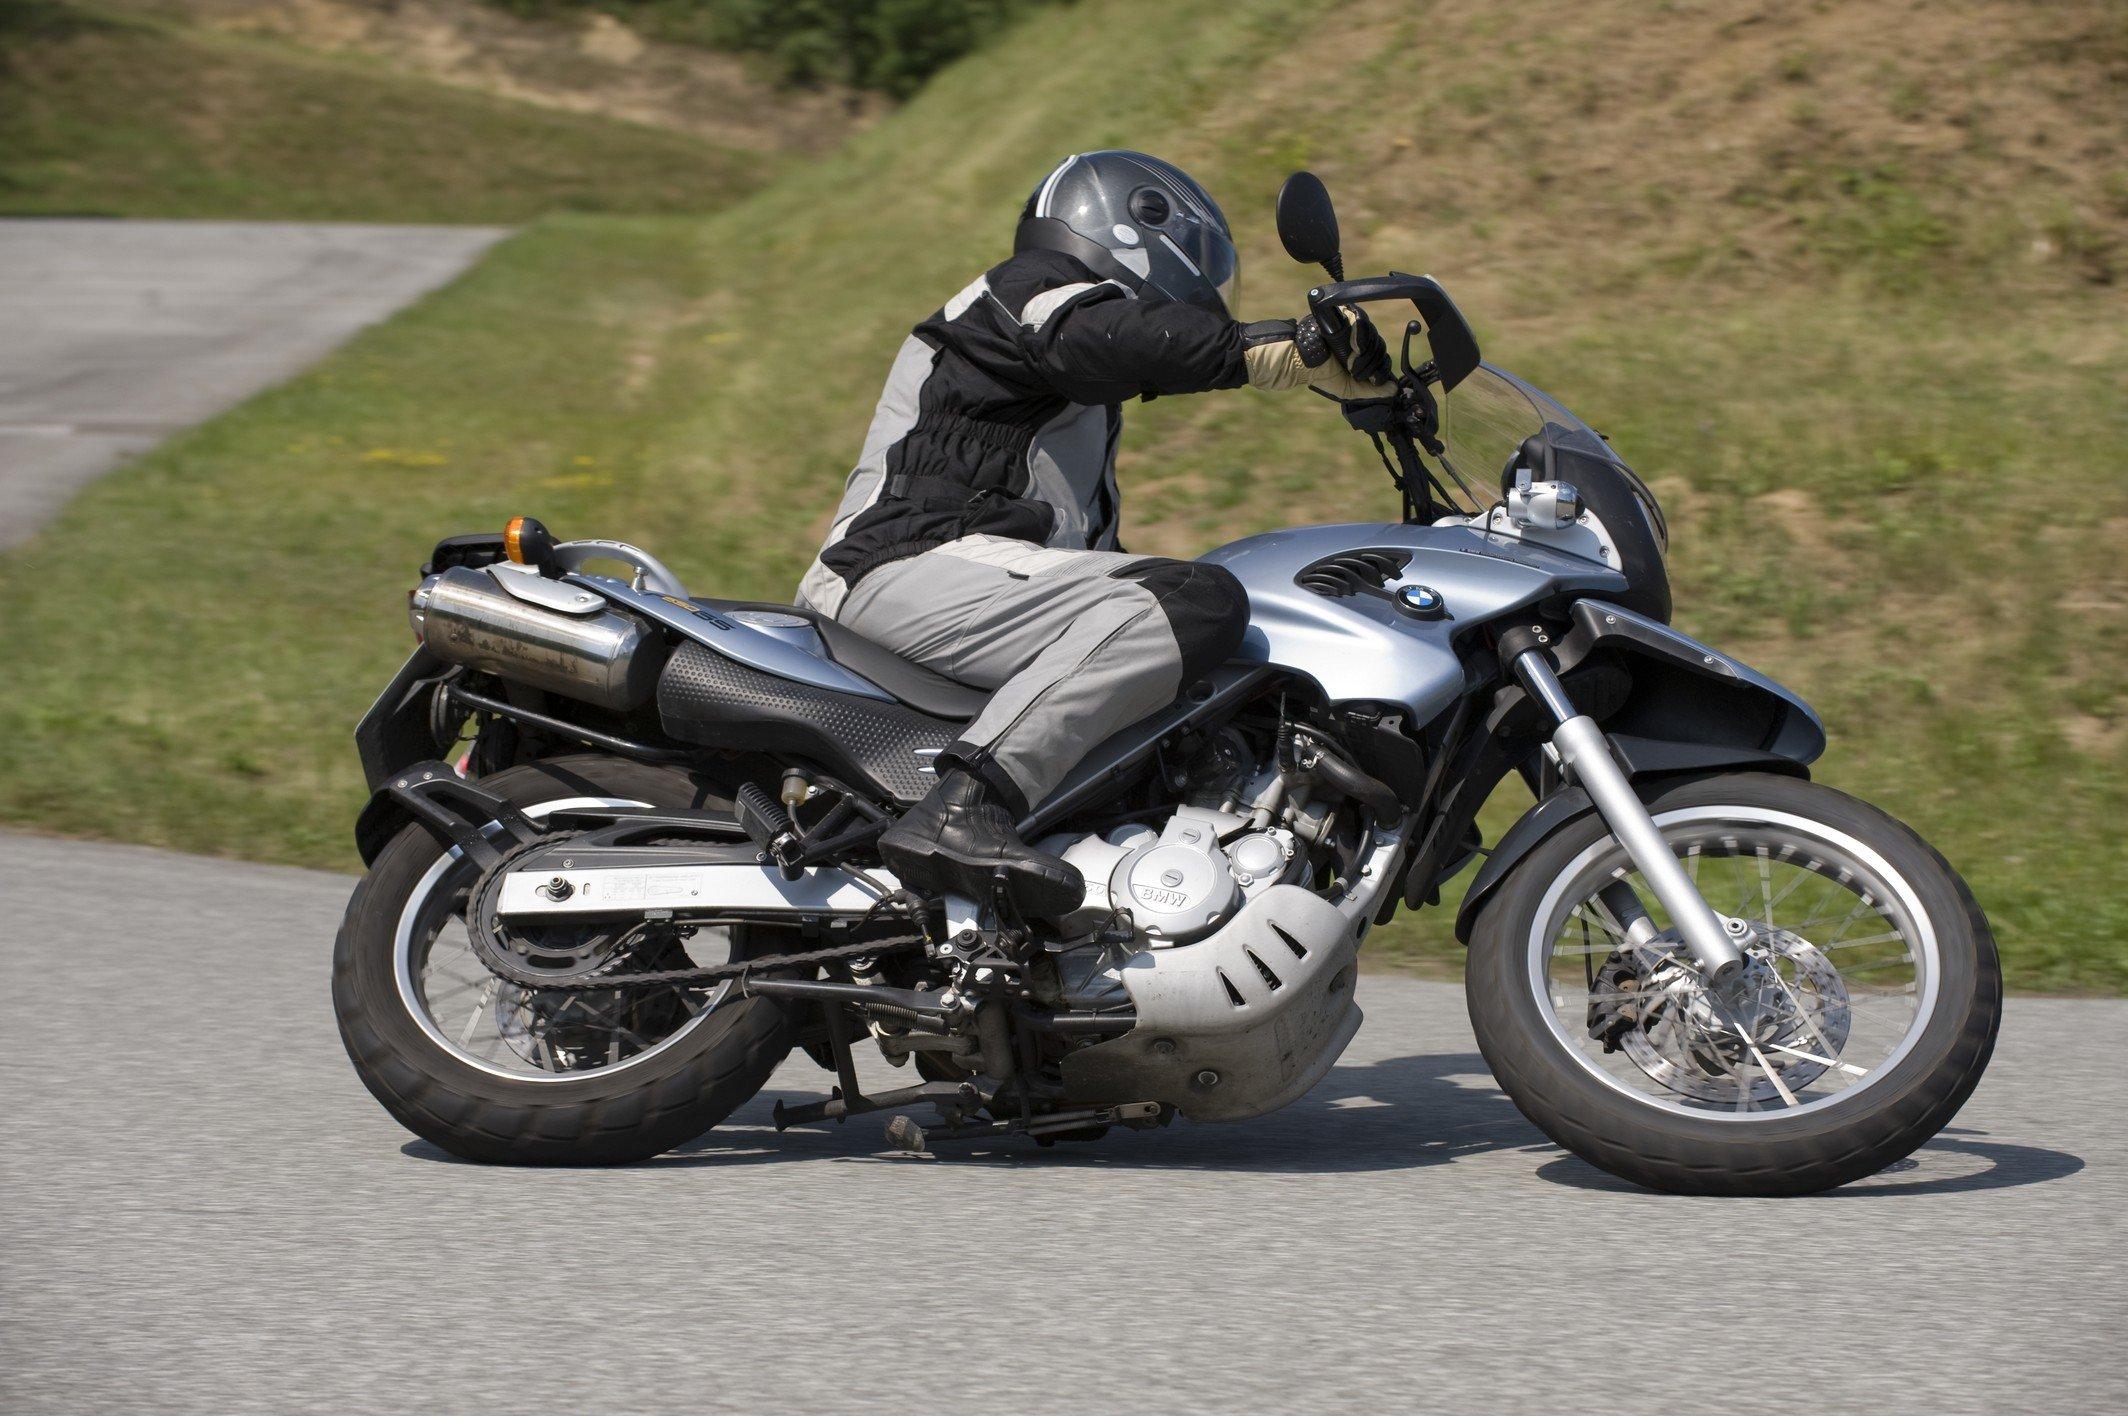 Motorrad-Sicherheitstraining-Kurventraining-043